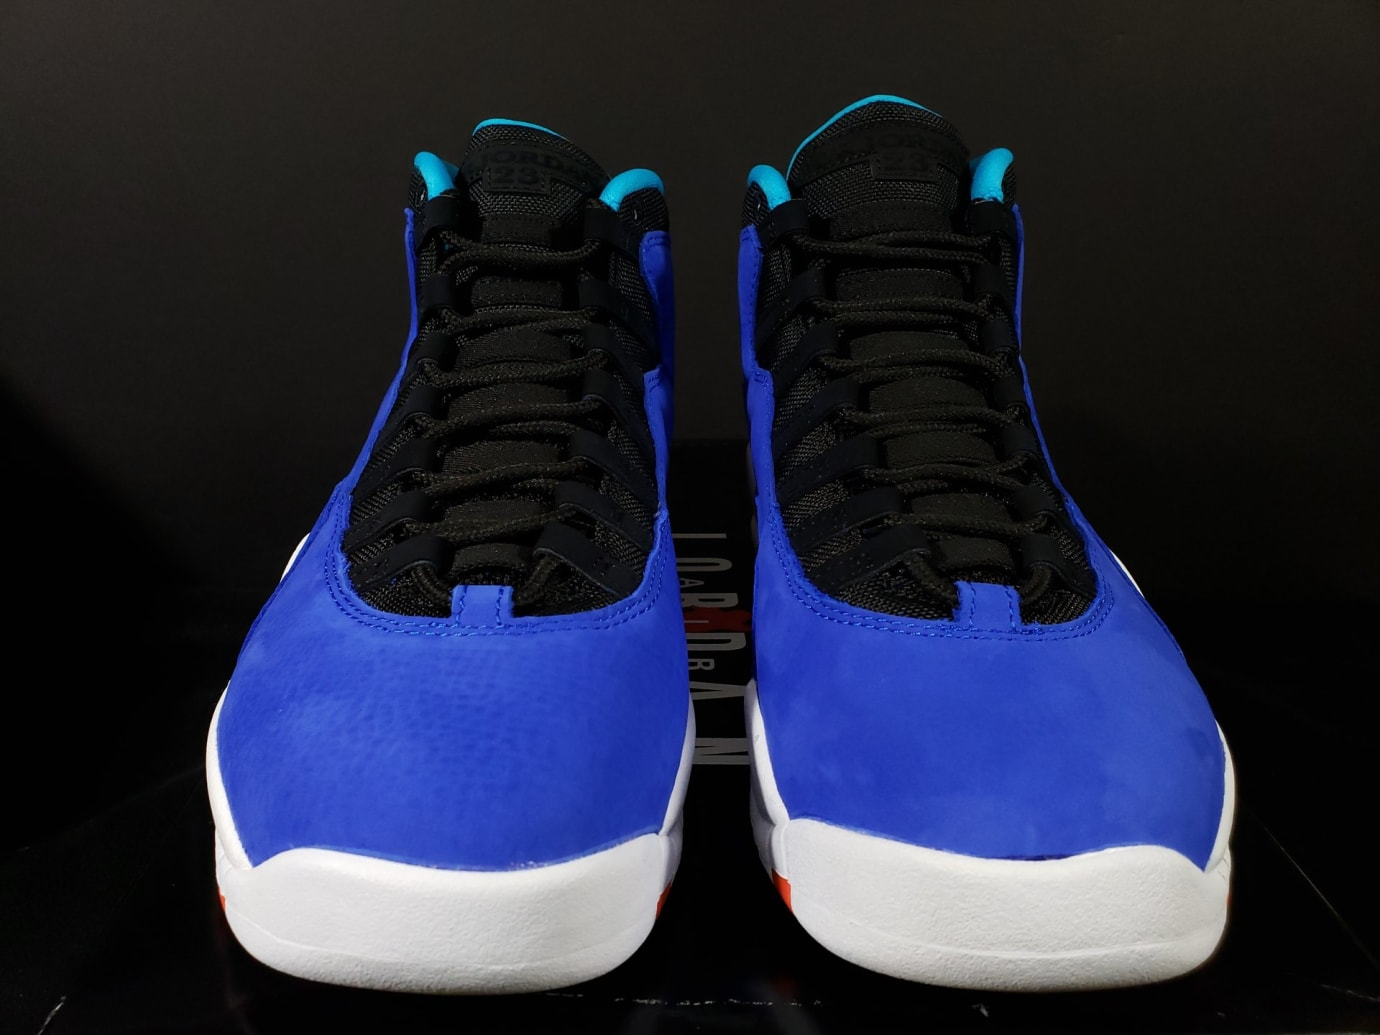 pretty nice b2d8e 54e93 Air Jordan 10 'Tinker' Release Date | Sole Collector